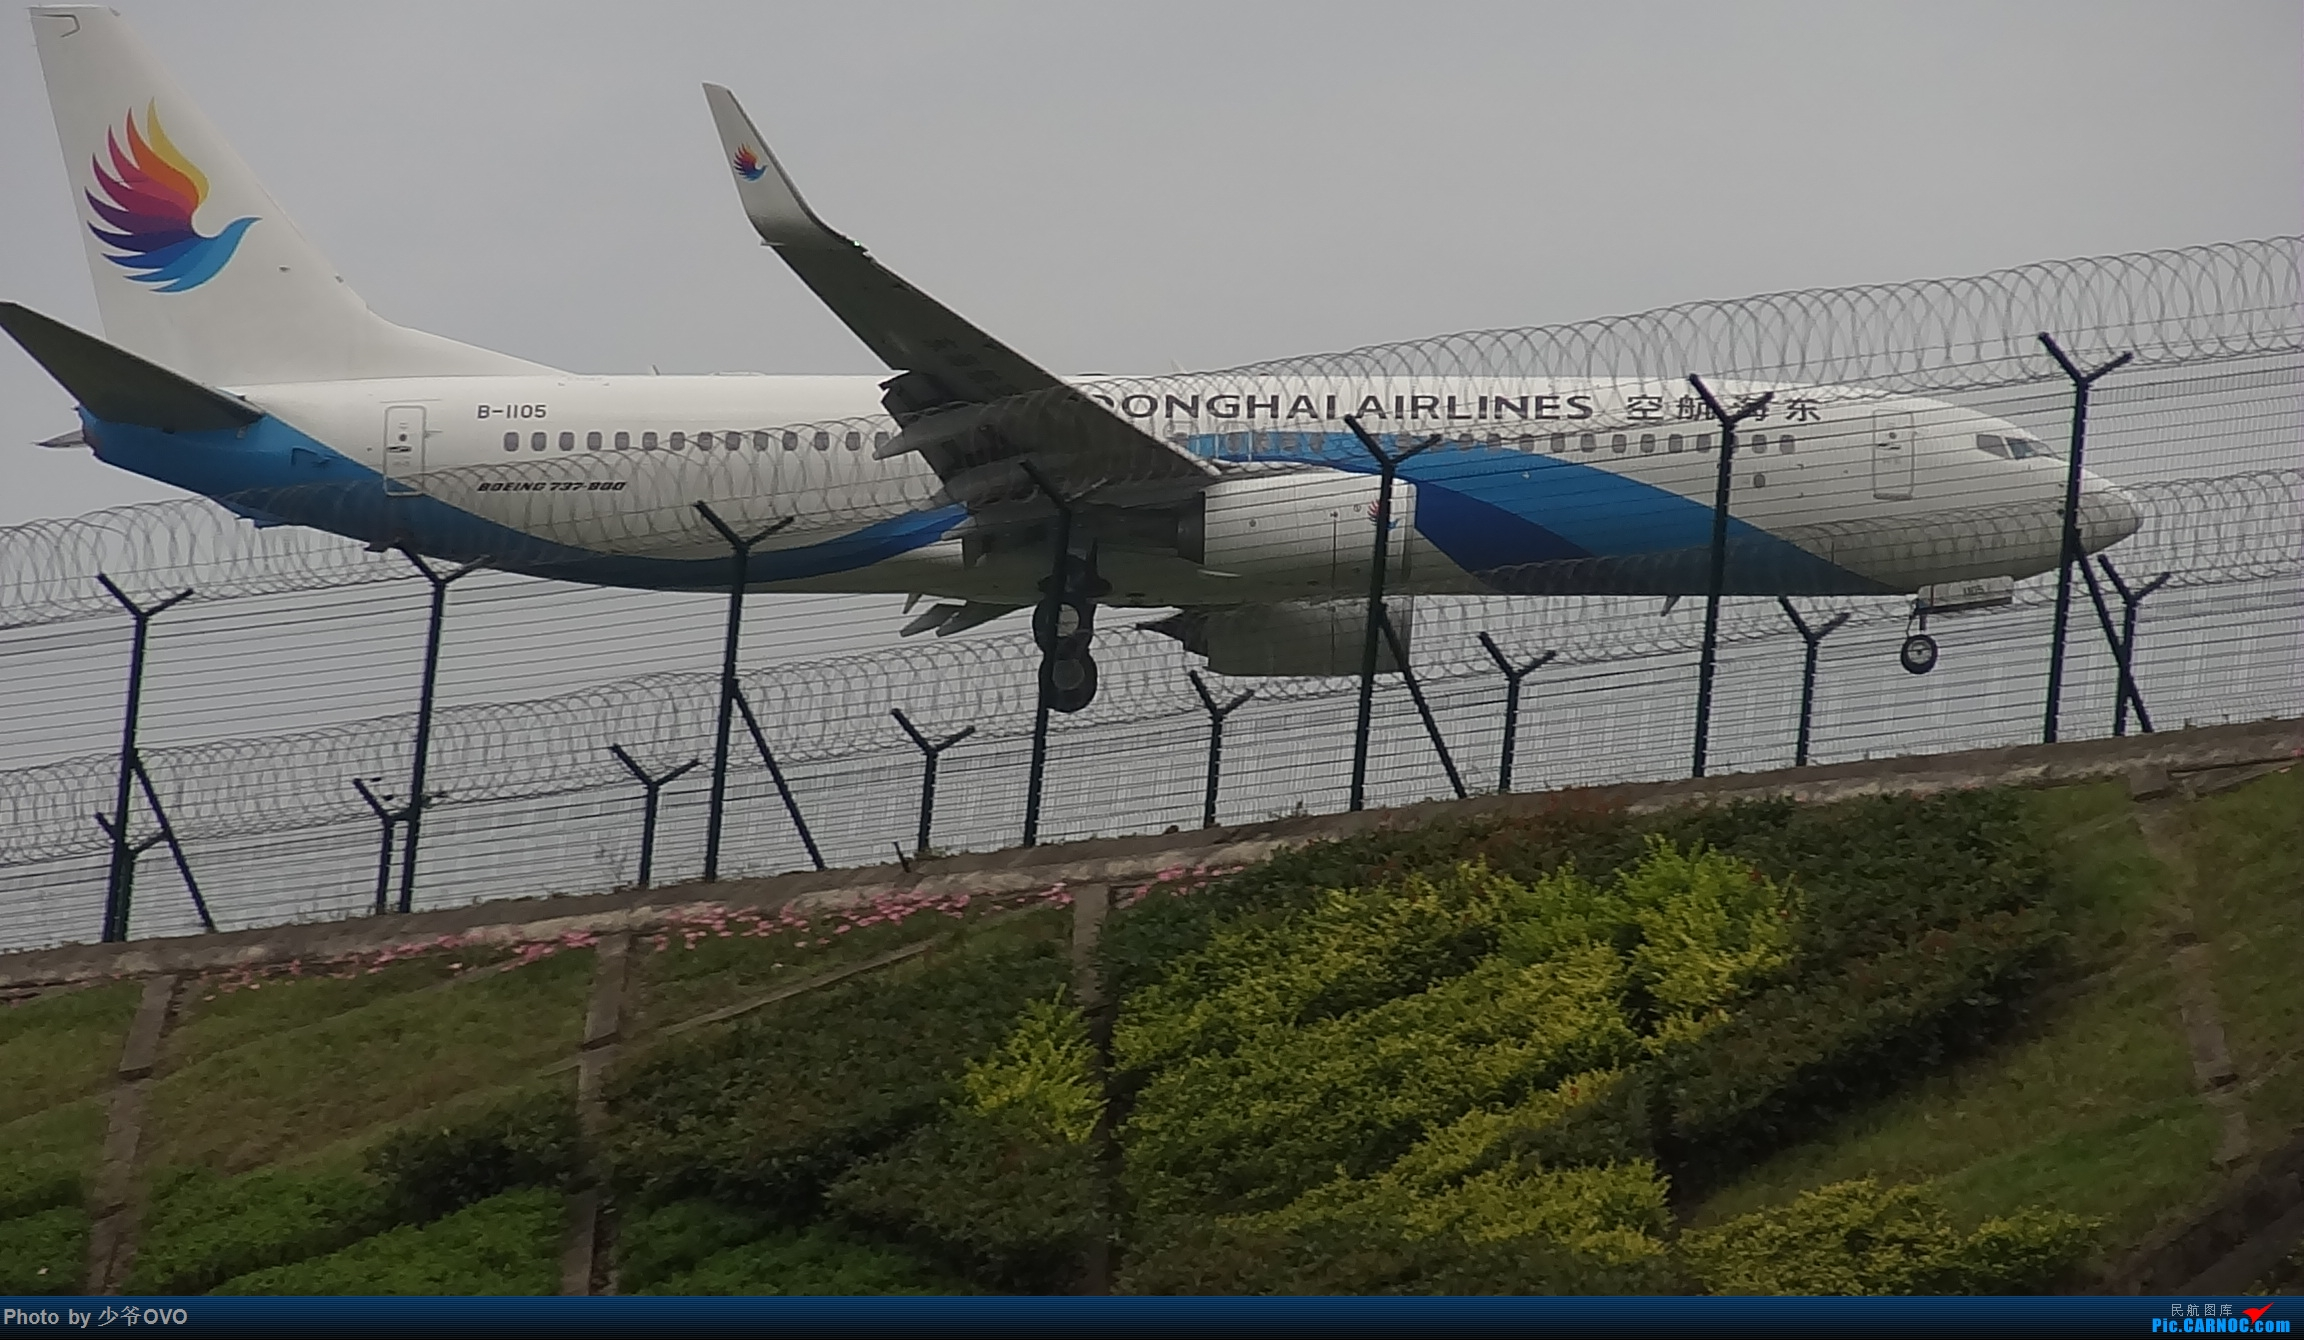 Re:[原创]CKG拍机,数码机最后的倔强 BOEING 737-800 B-1105 中国重庆江北国际机场